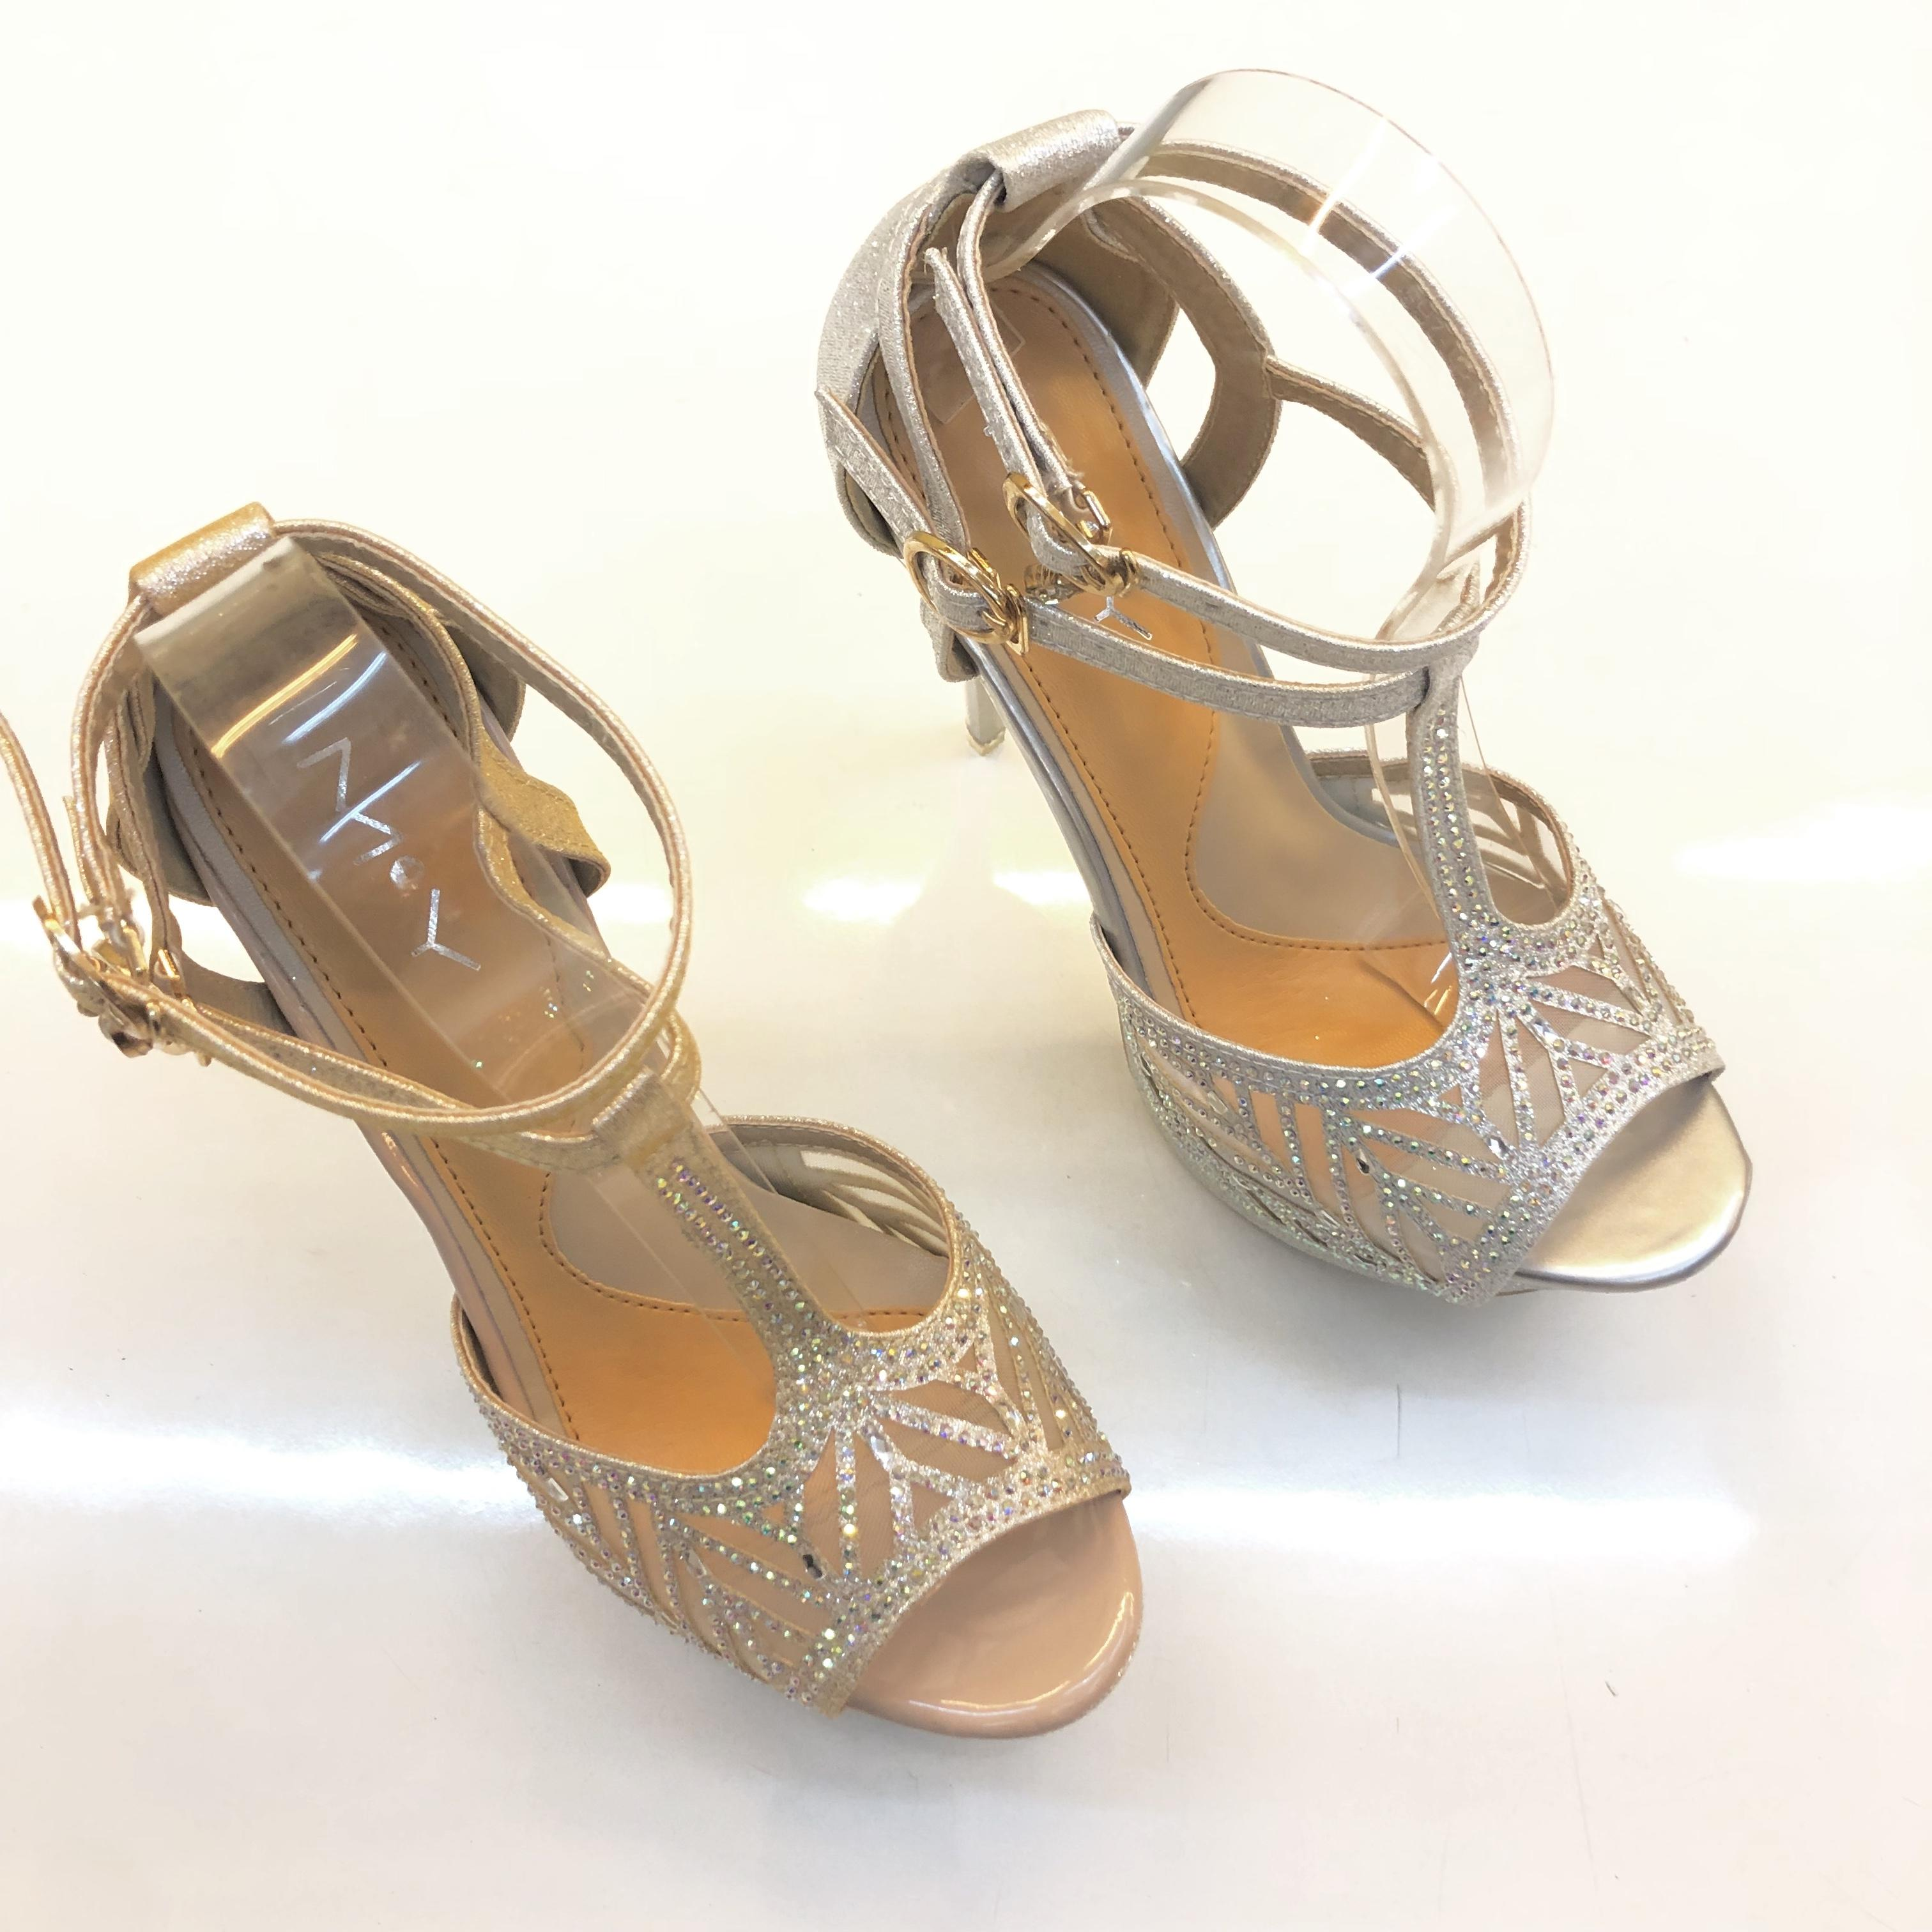 e98fdbbdd74 DS Korean Best seller Summer Women Fashion High Heel Peep Toe Platform  Stiletto Ankle Crisscross Strap